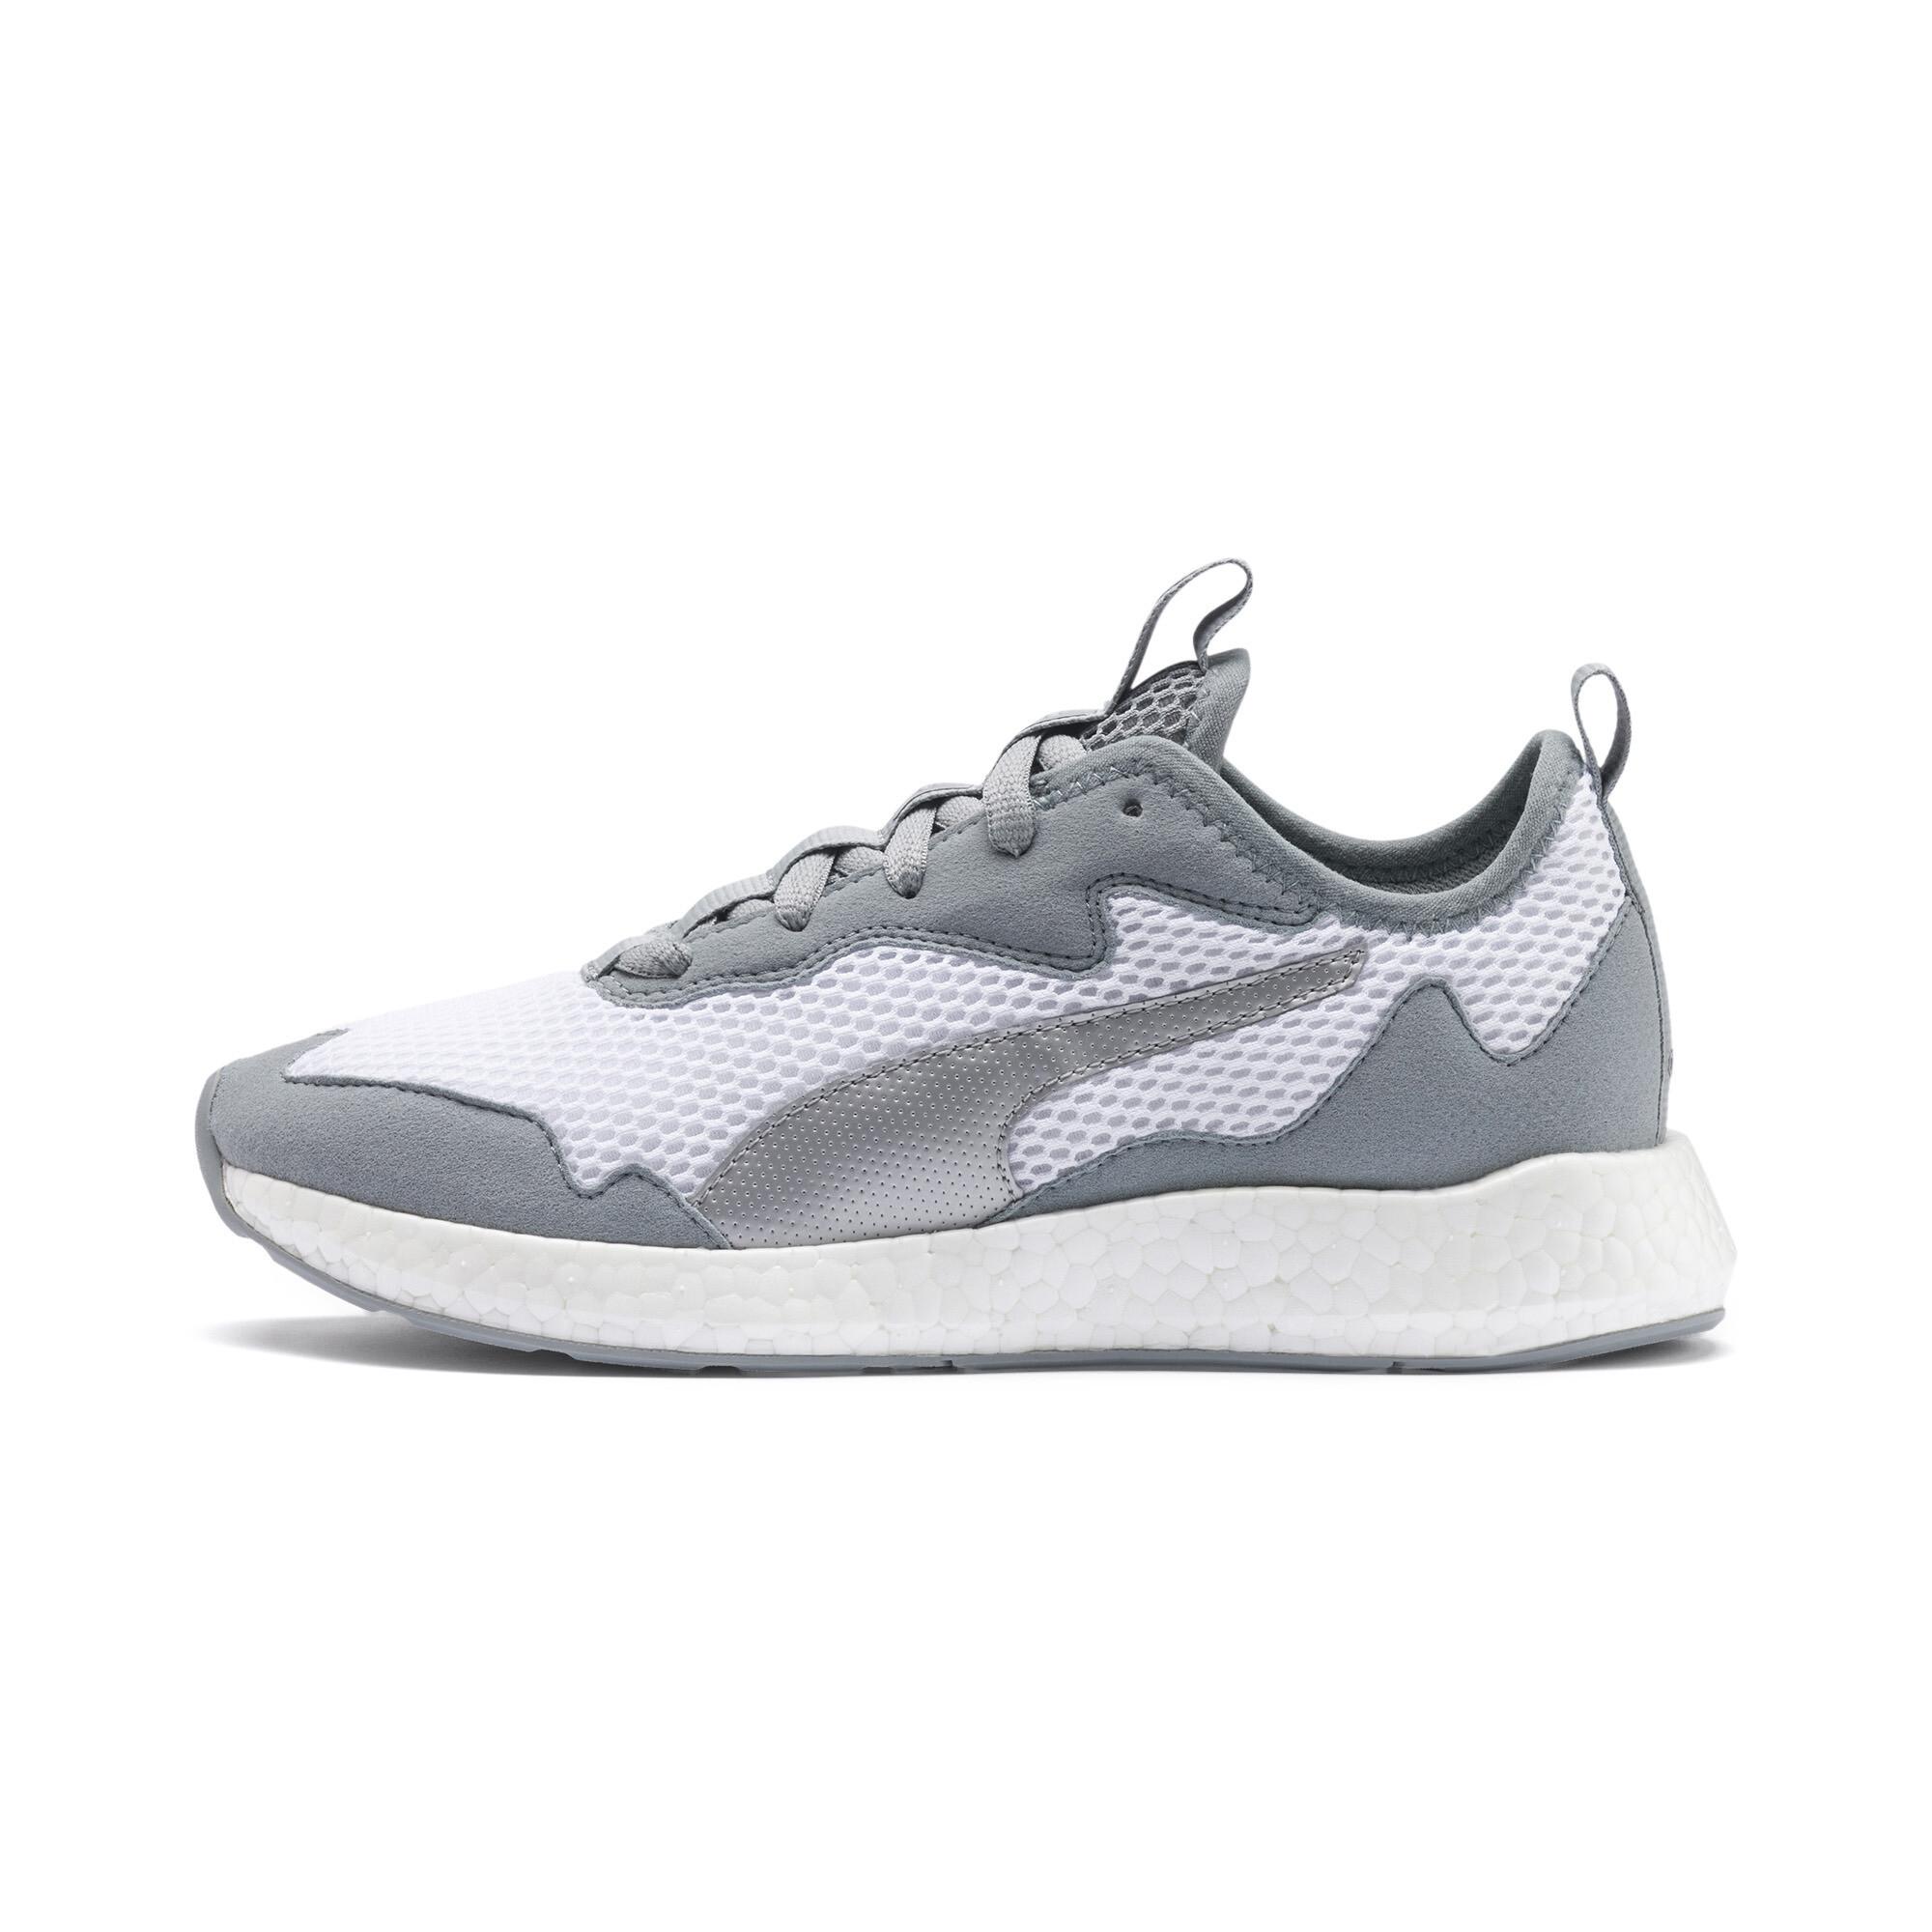 PUMA-Women-039-s-NRGY-Neko-Skim-Running-Shoes thumbnail 4